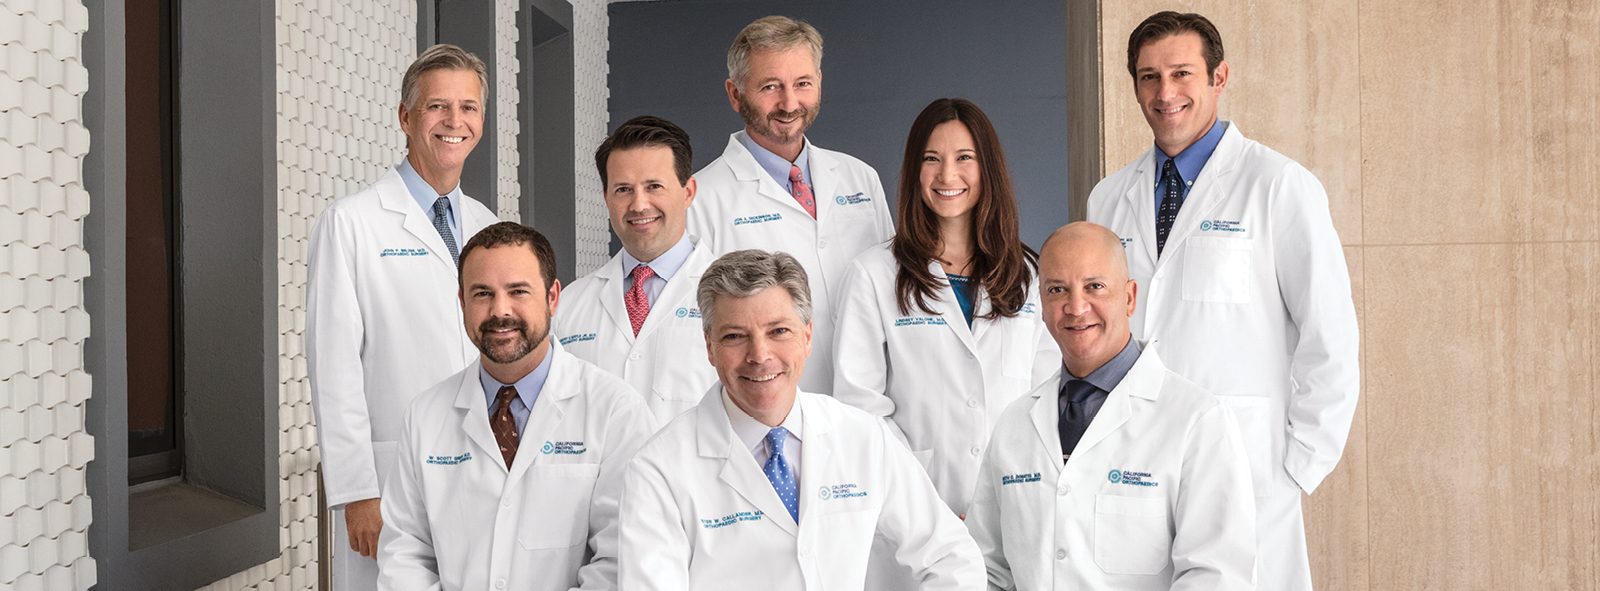 california pacific orthopaedics | first republic bank